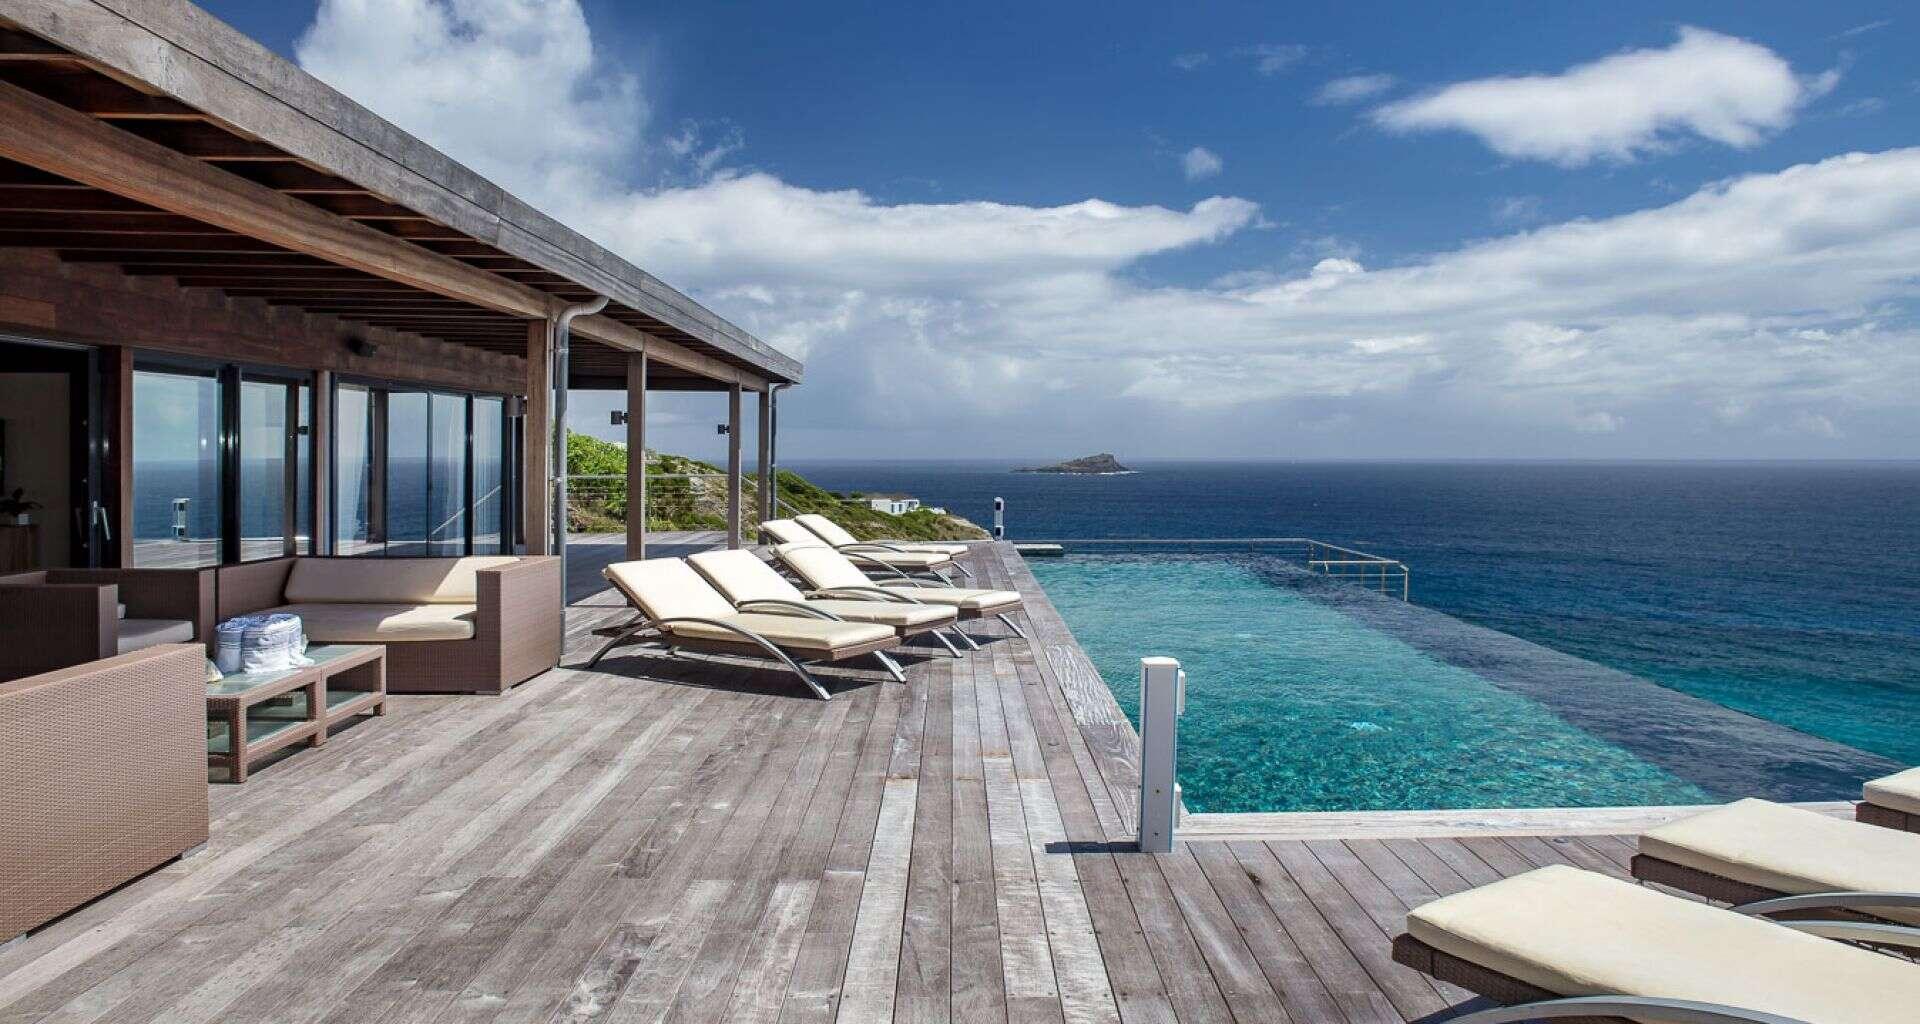 Luxury villa rentals caribbean - St barthelemy - Pointe milou - No location 4 - Seascape - Image 1/12